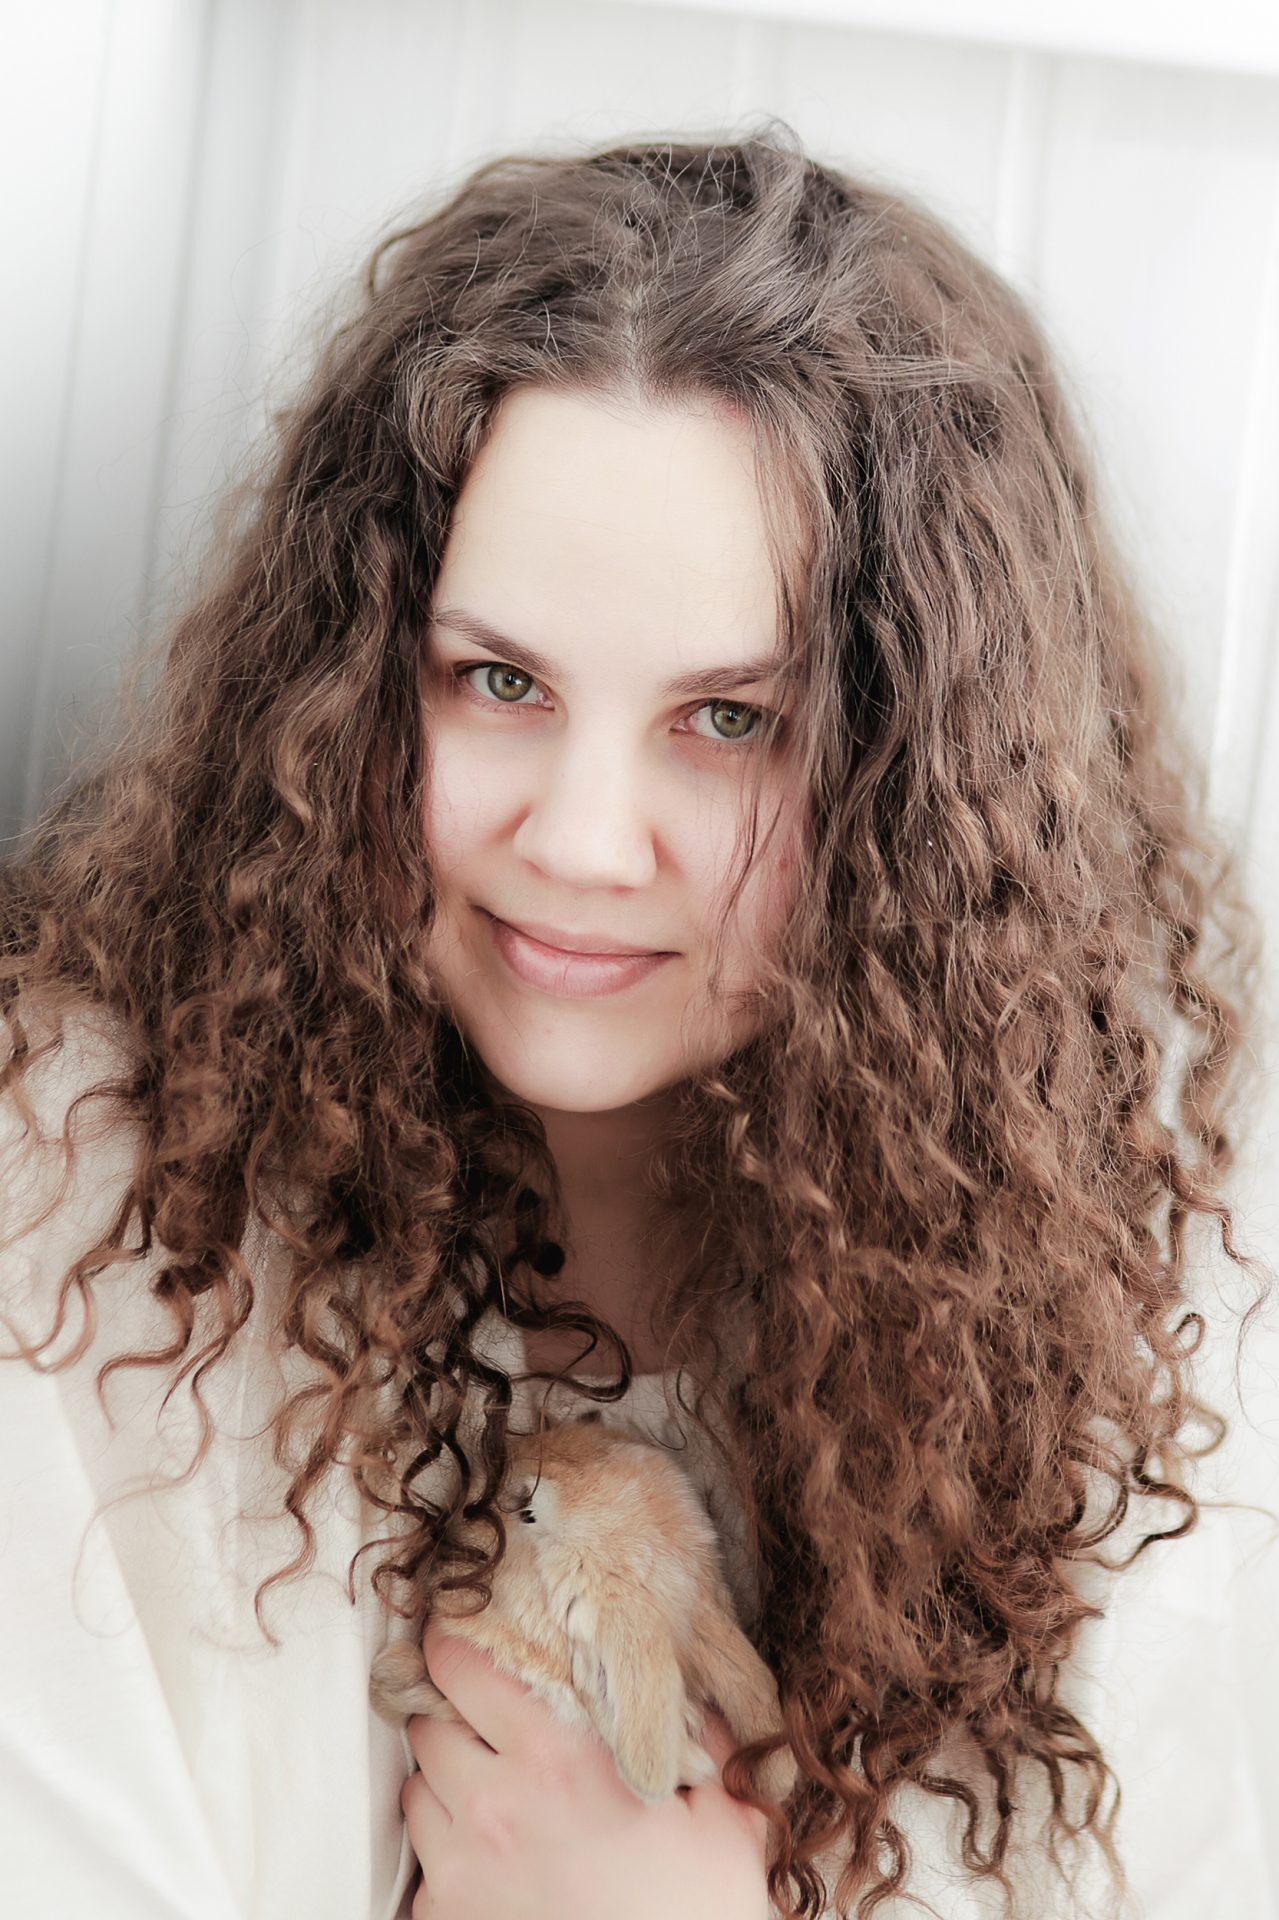 Alexandra Antonova